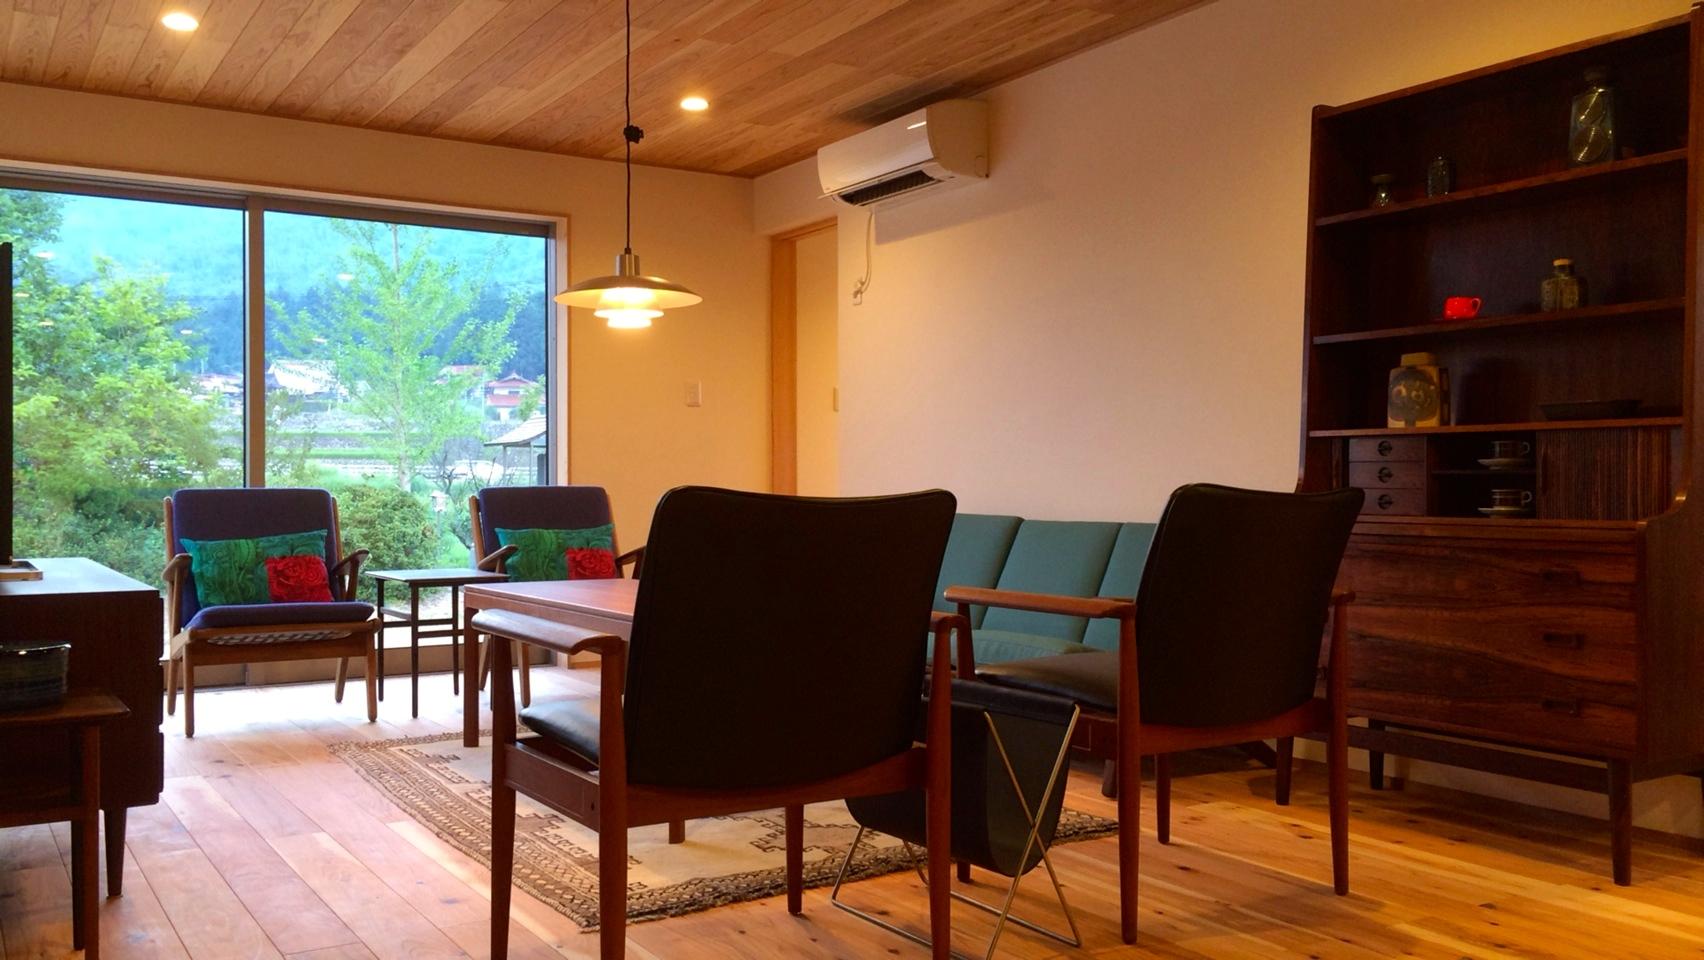 http://www.sora-design.com/images/bl-2648.JPG